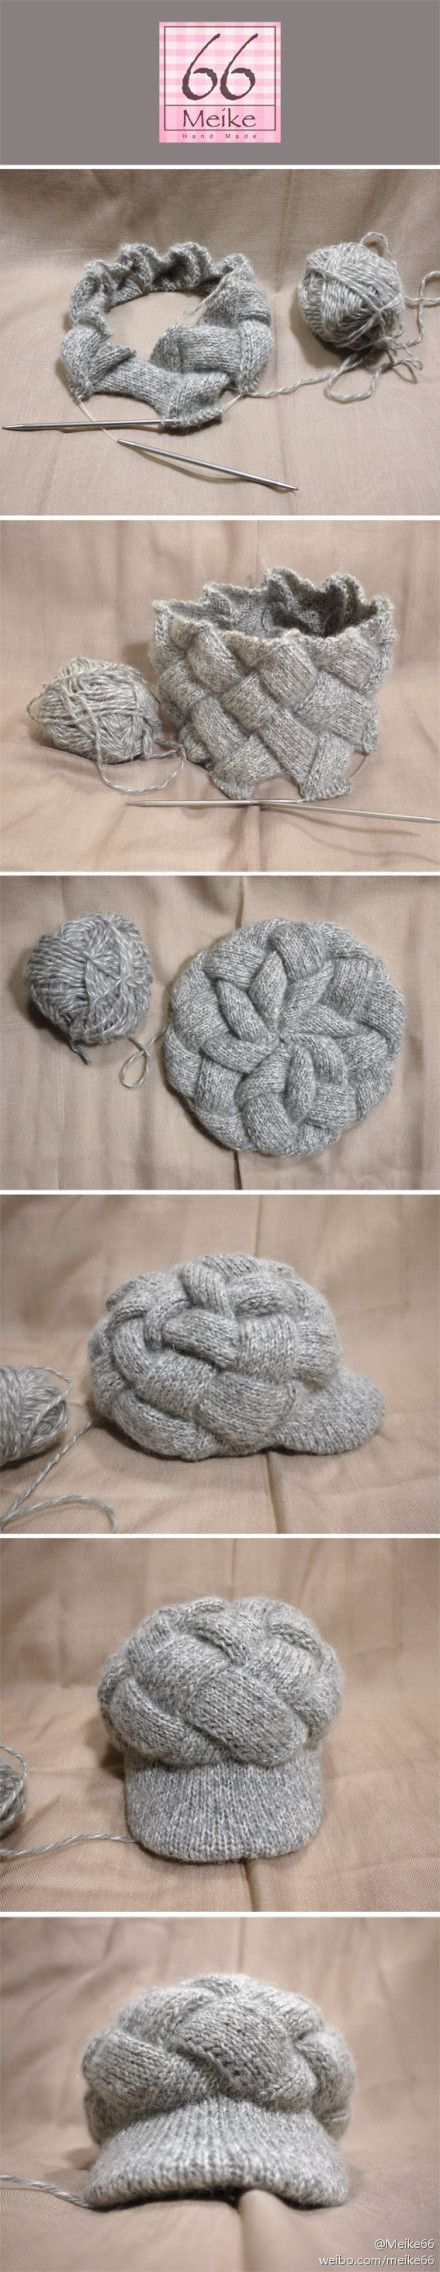 interestic enterlac hat